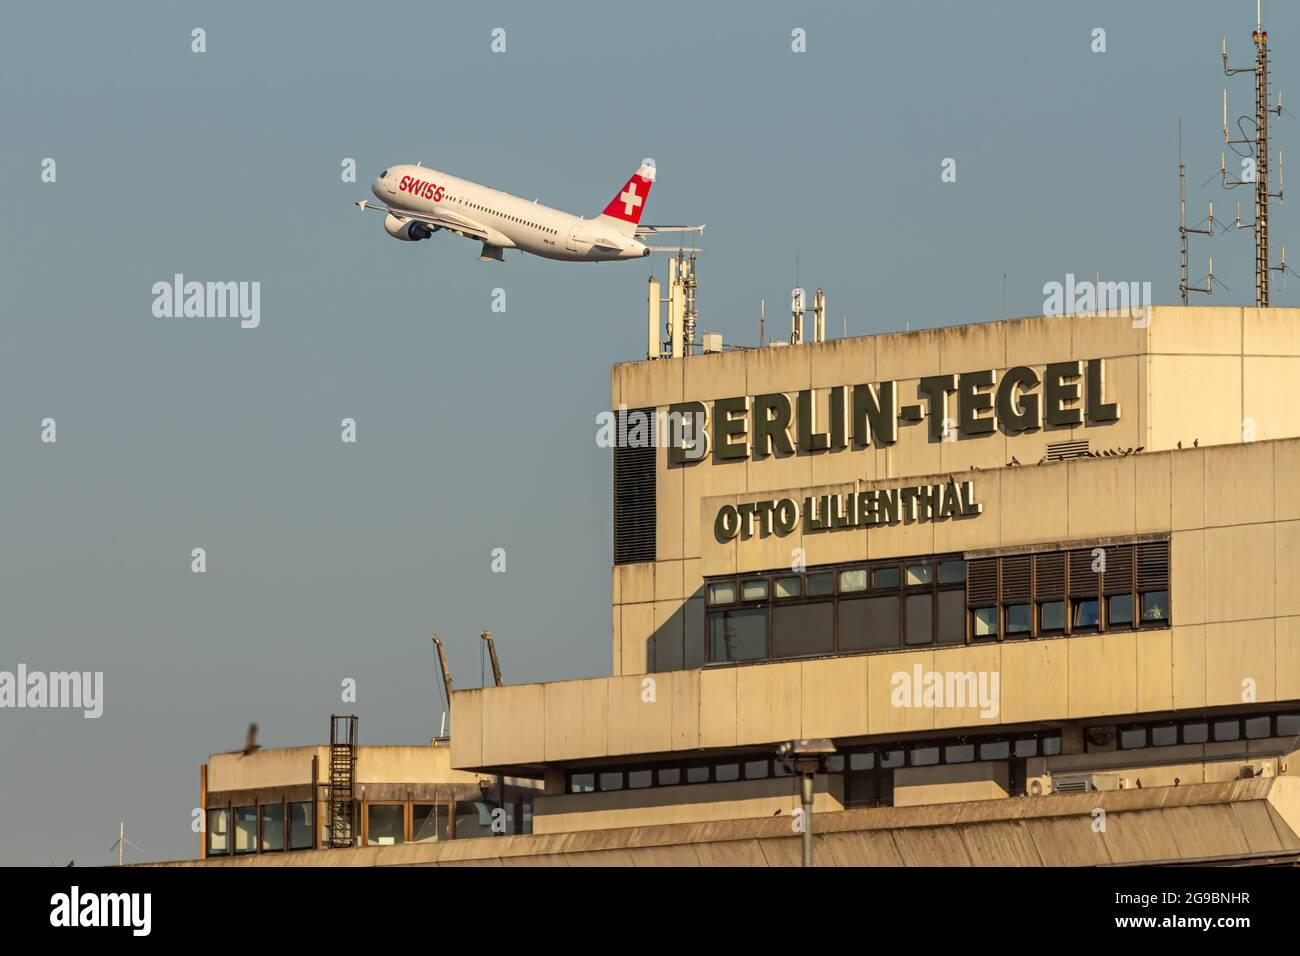 Berlin, Germany - September 15, 2018: Berlin Tegel - Otto Lilienthal Airport Terminal building, TXL, EDDT Stock Photo